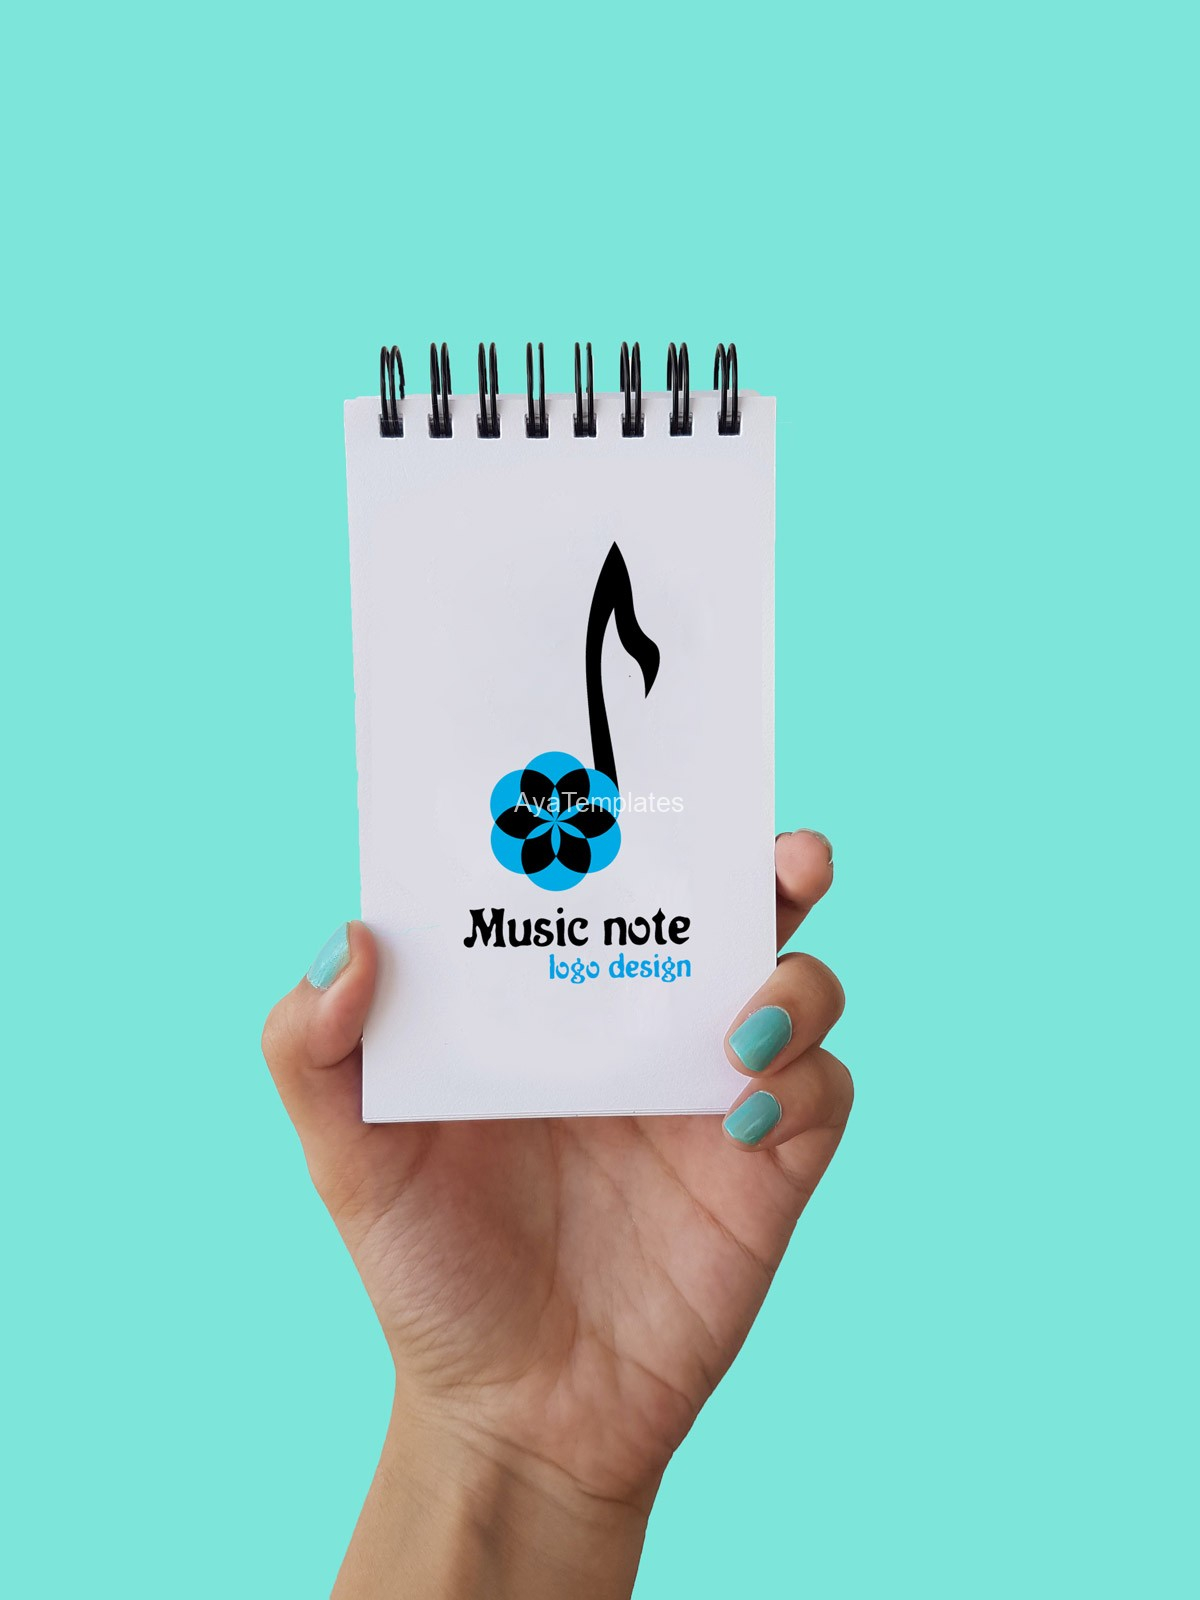 music-logo-design-brand-identity-mockup-ayatemplates